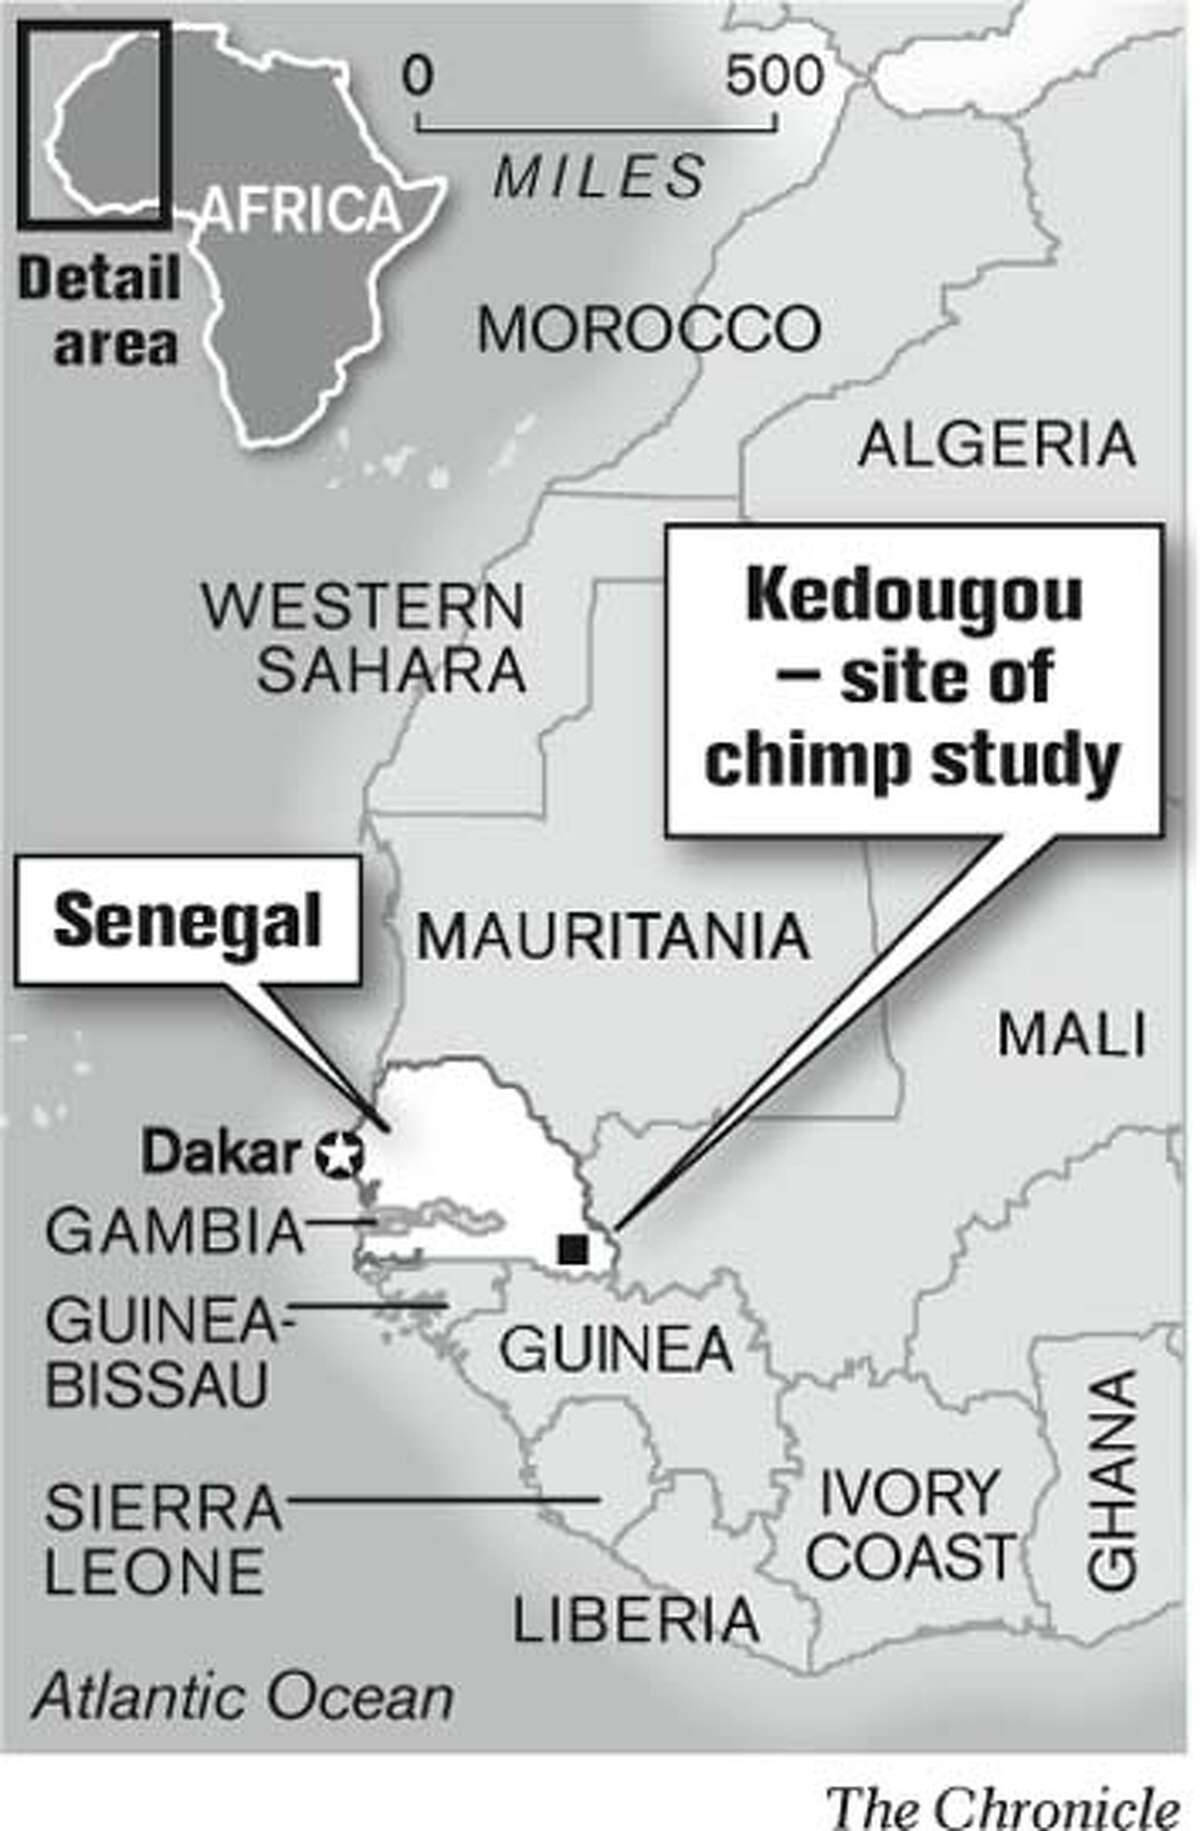 Kedougou - site of chimp study. Chronicle Graphic